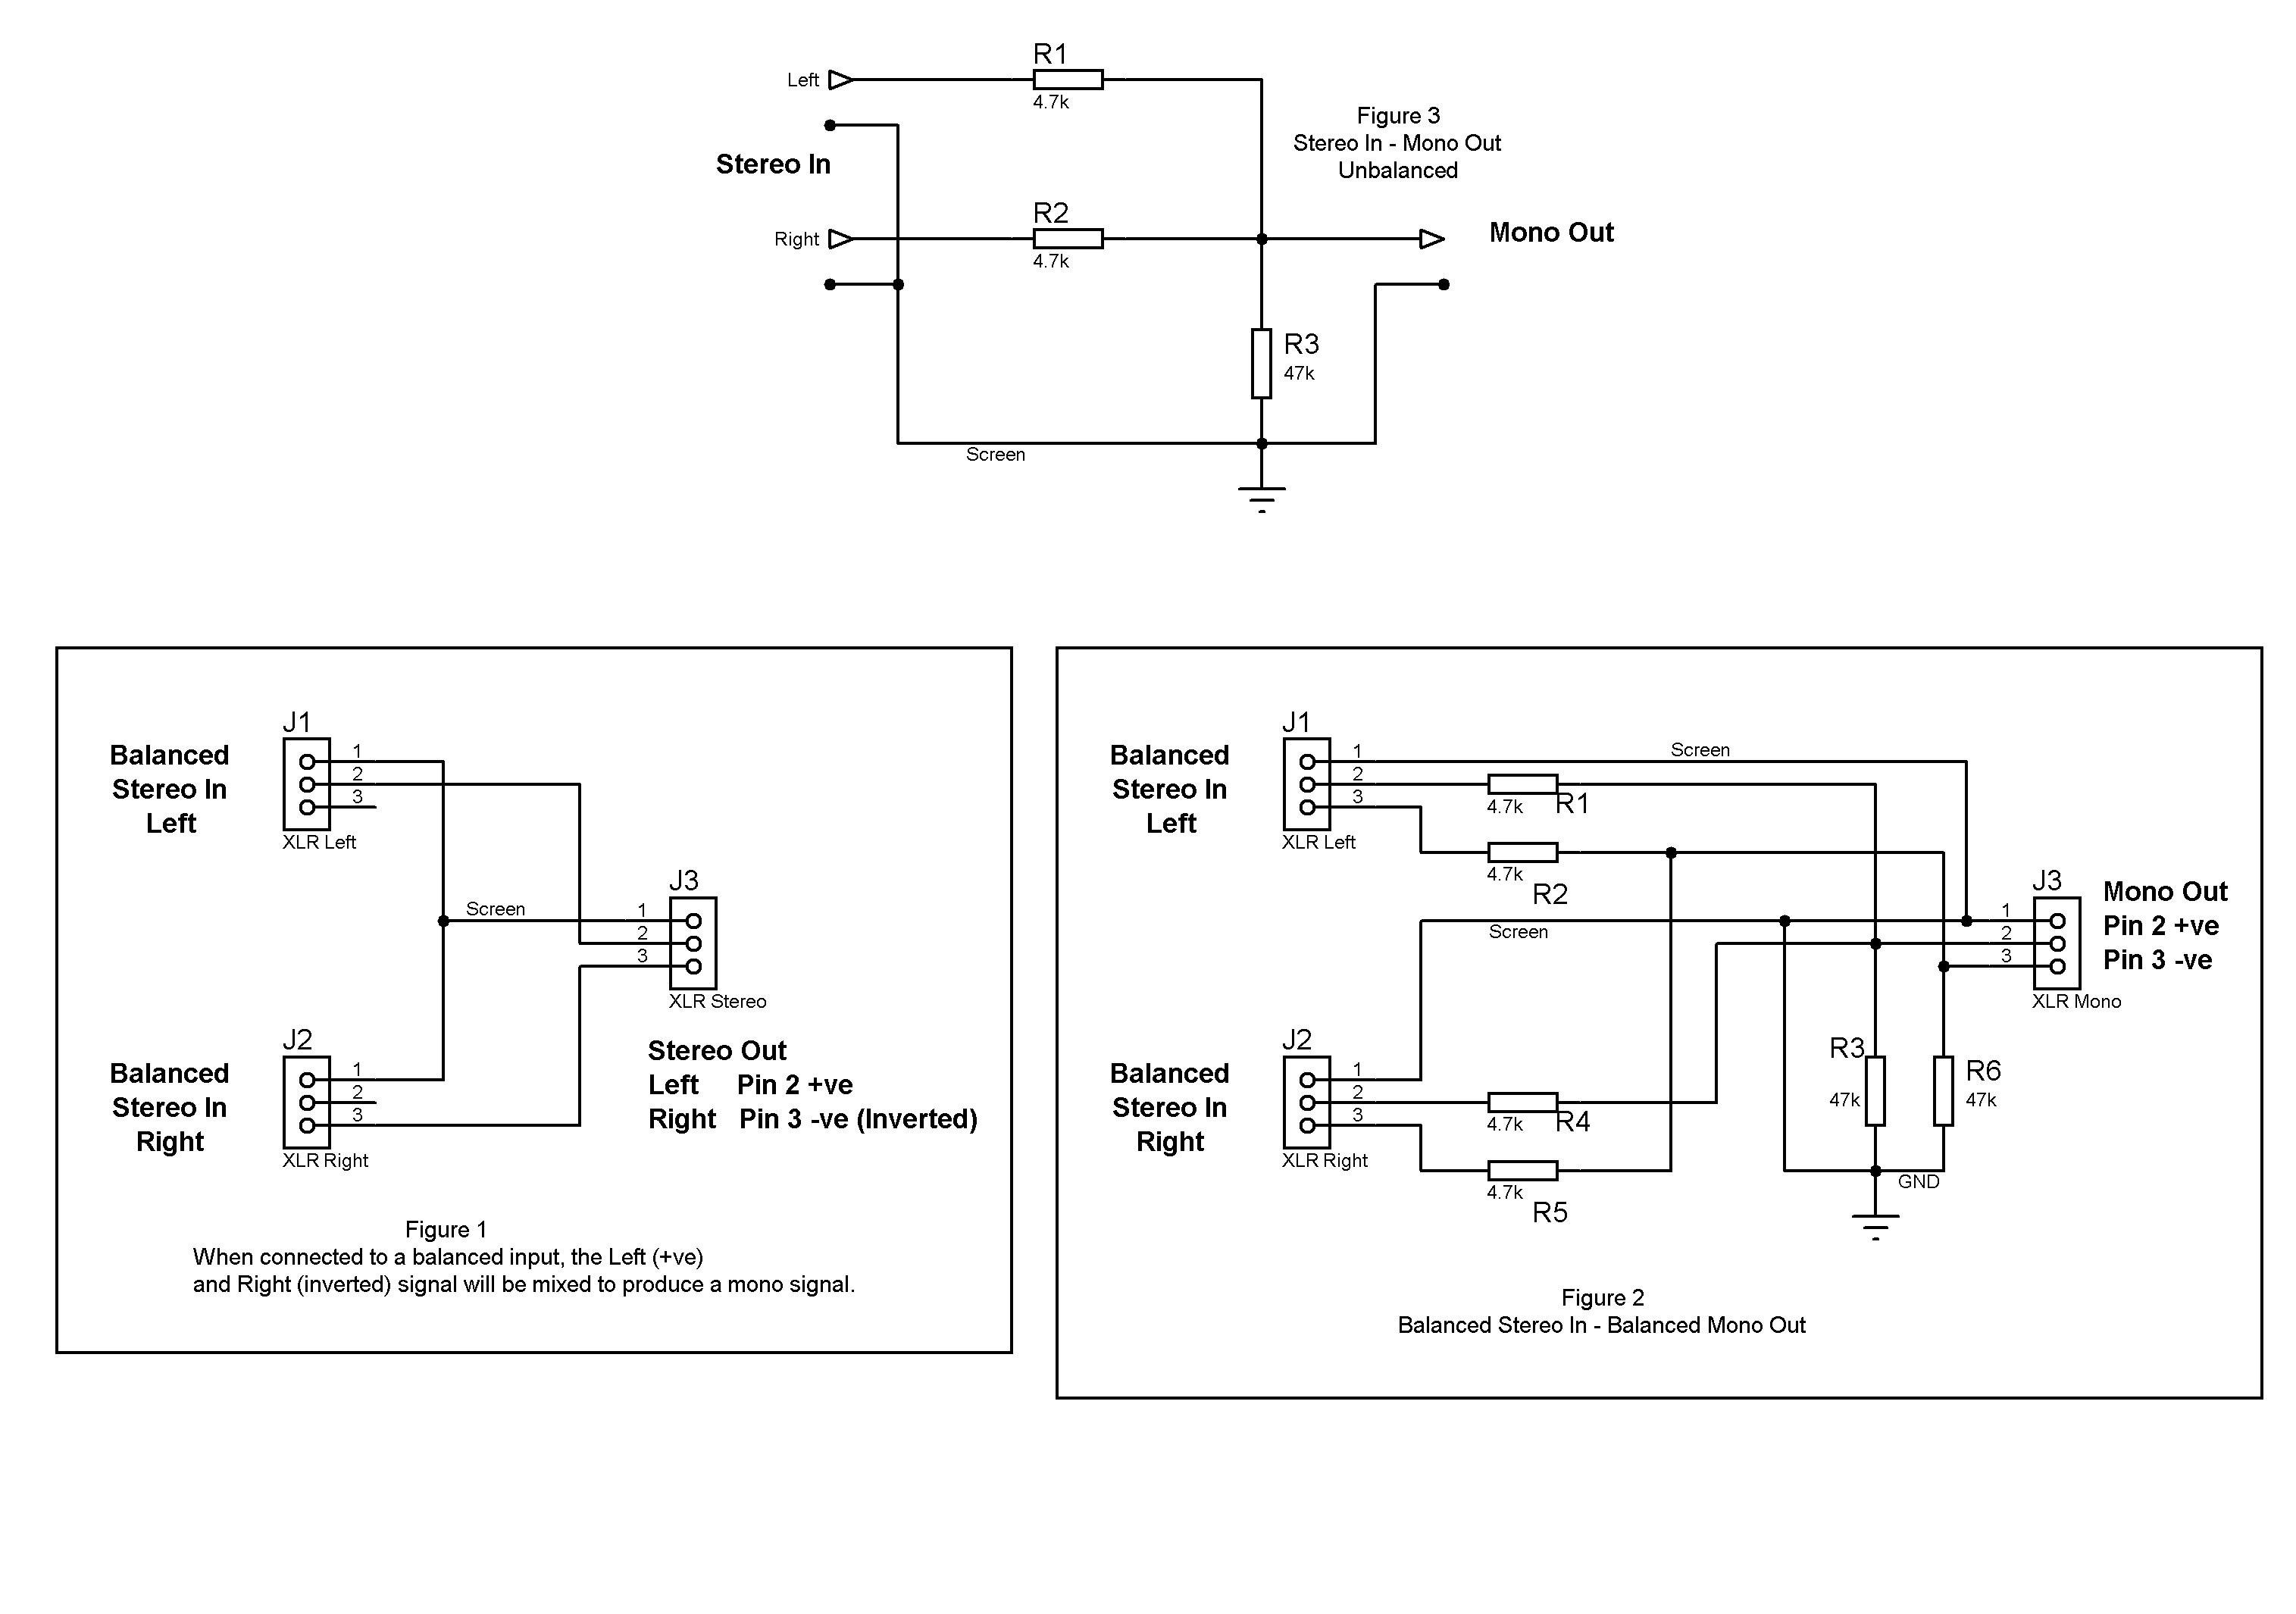 Xlr to Mono Jack Wiring Diagram Luxury Wiring Xlr Connectors Diagram Fresh Xlr to Rca Cable Related Post